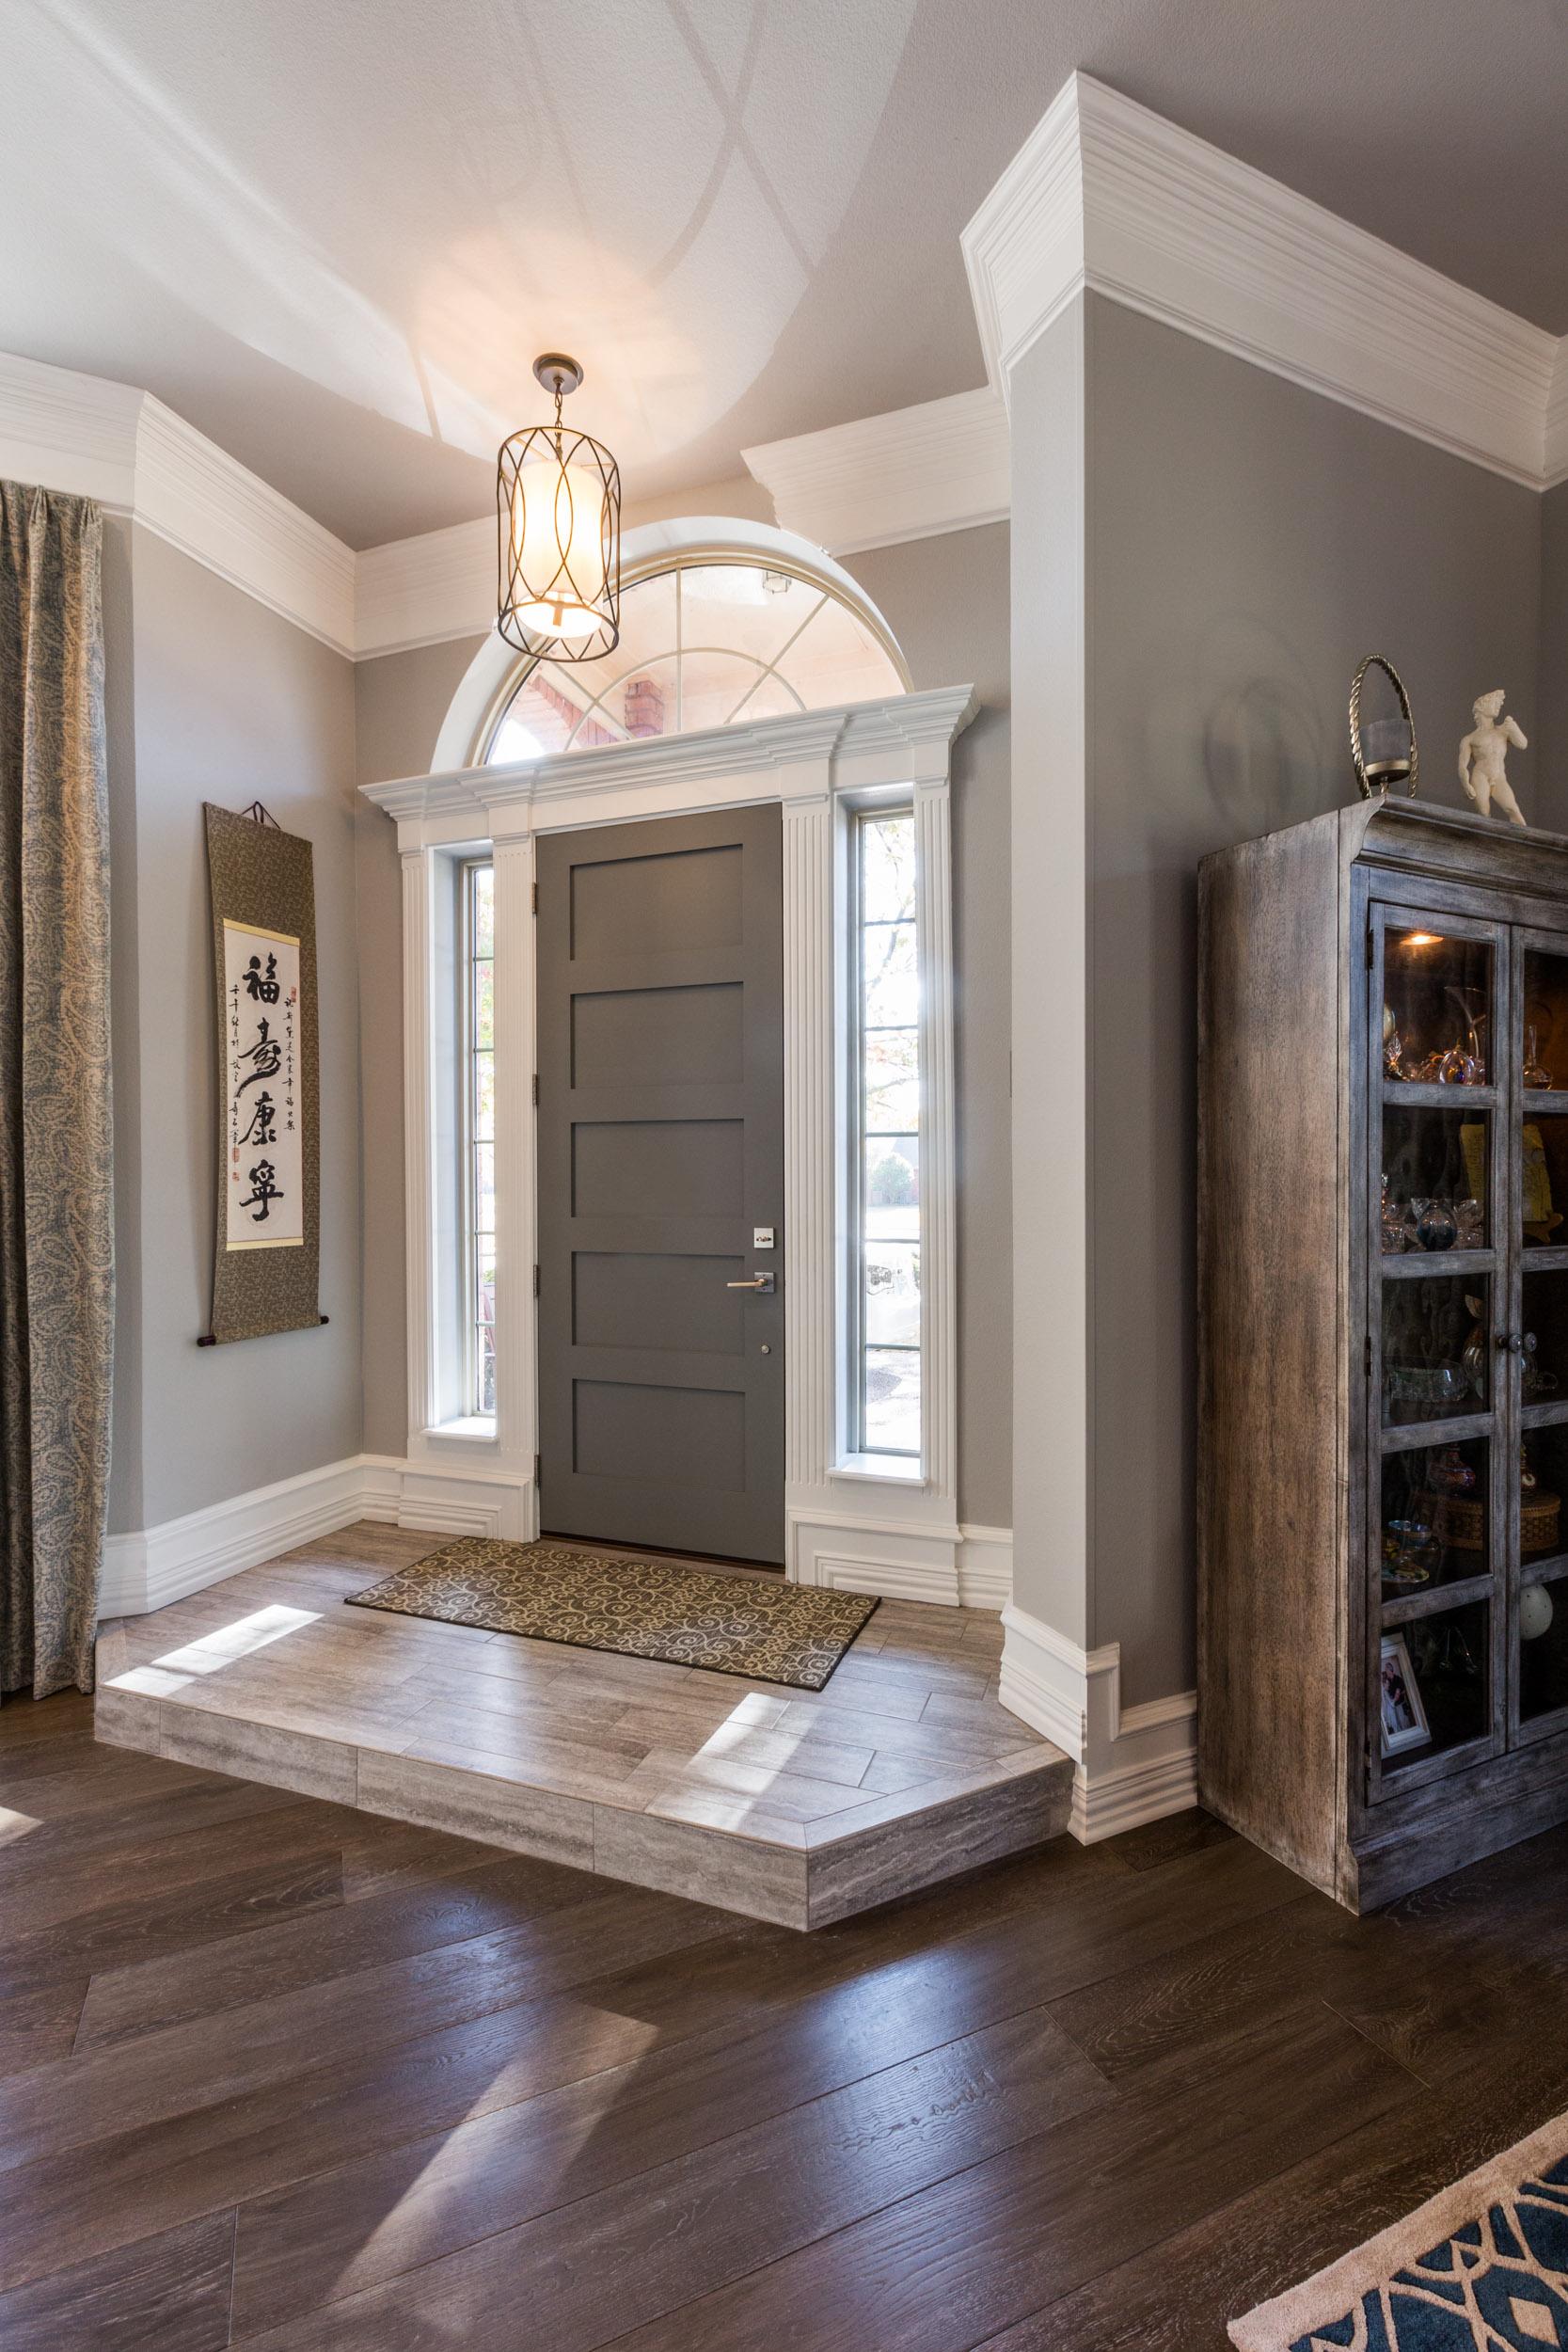 New front door with solid wood